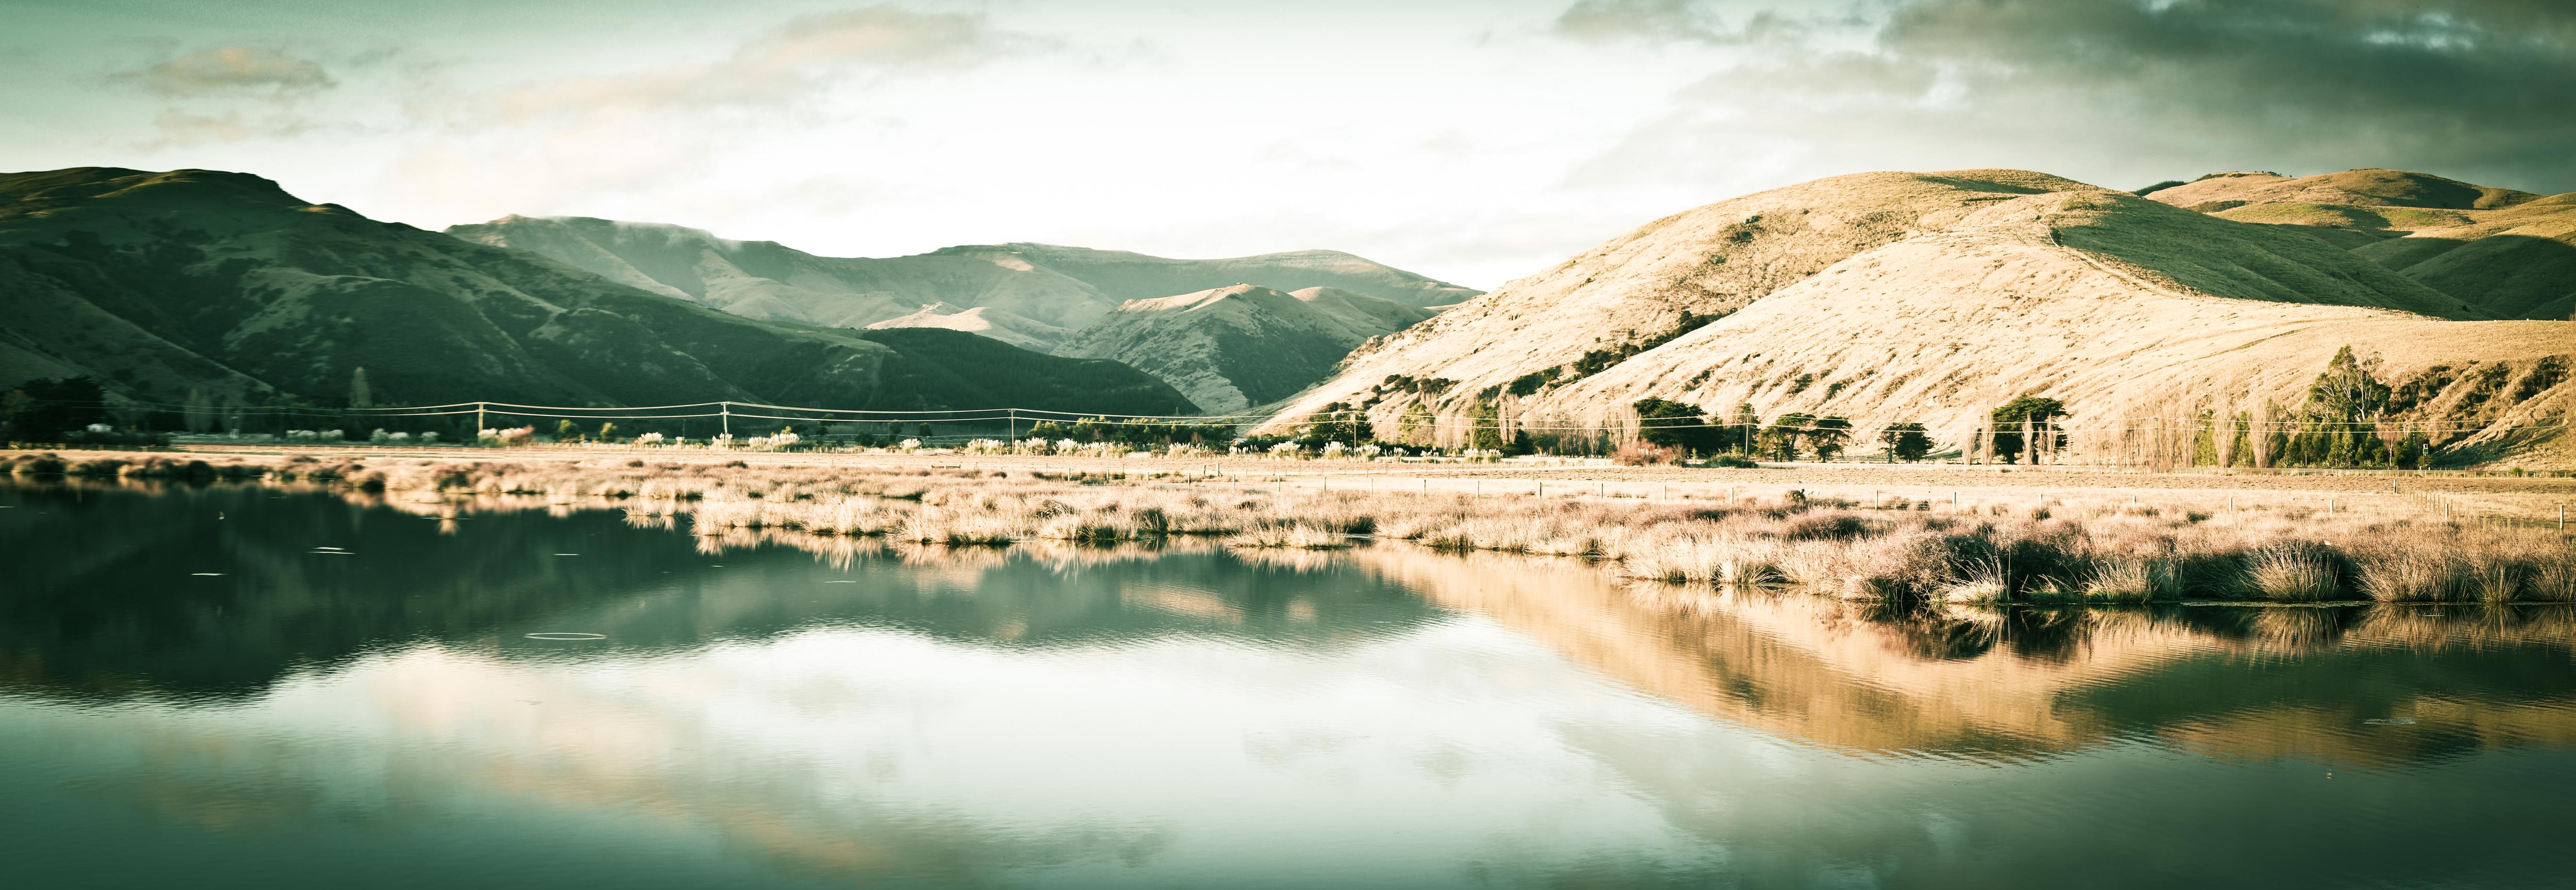 Untitled_Panorama4-3+small